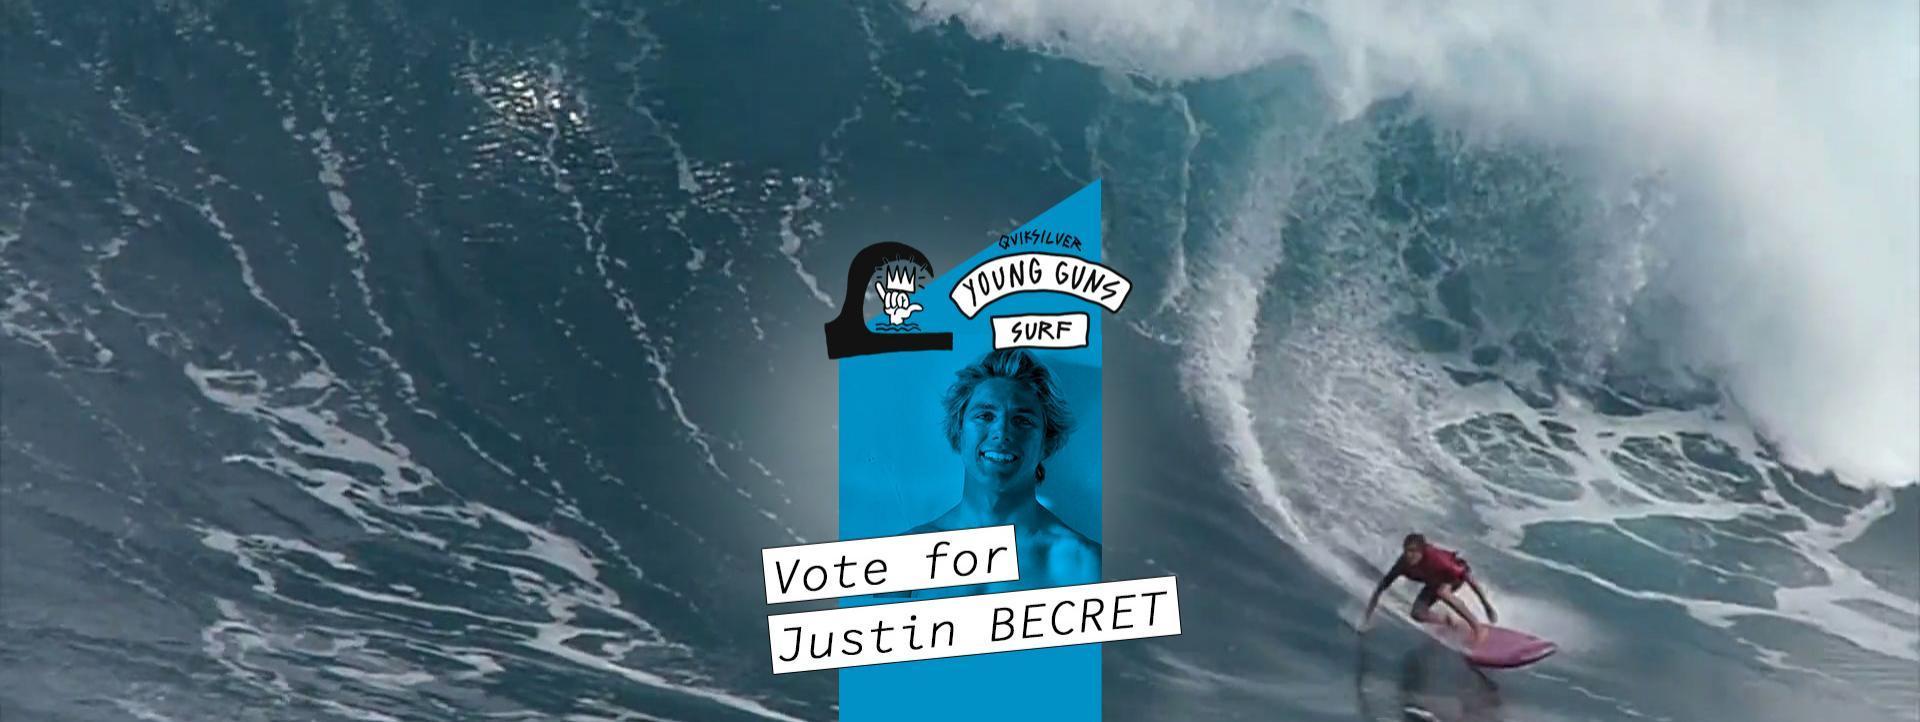 News Surf Quiksilver Young Guns Surf : vote Justin Becret !